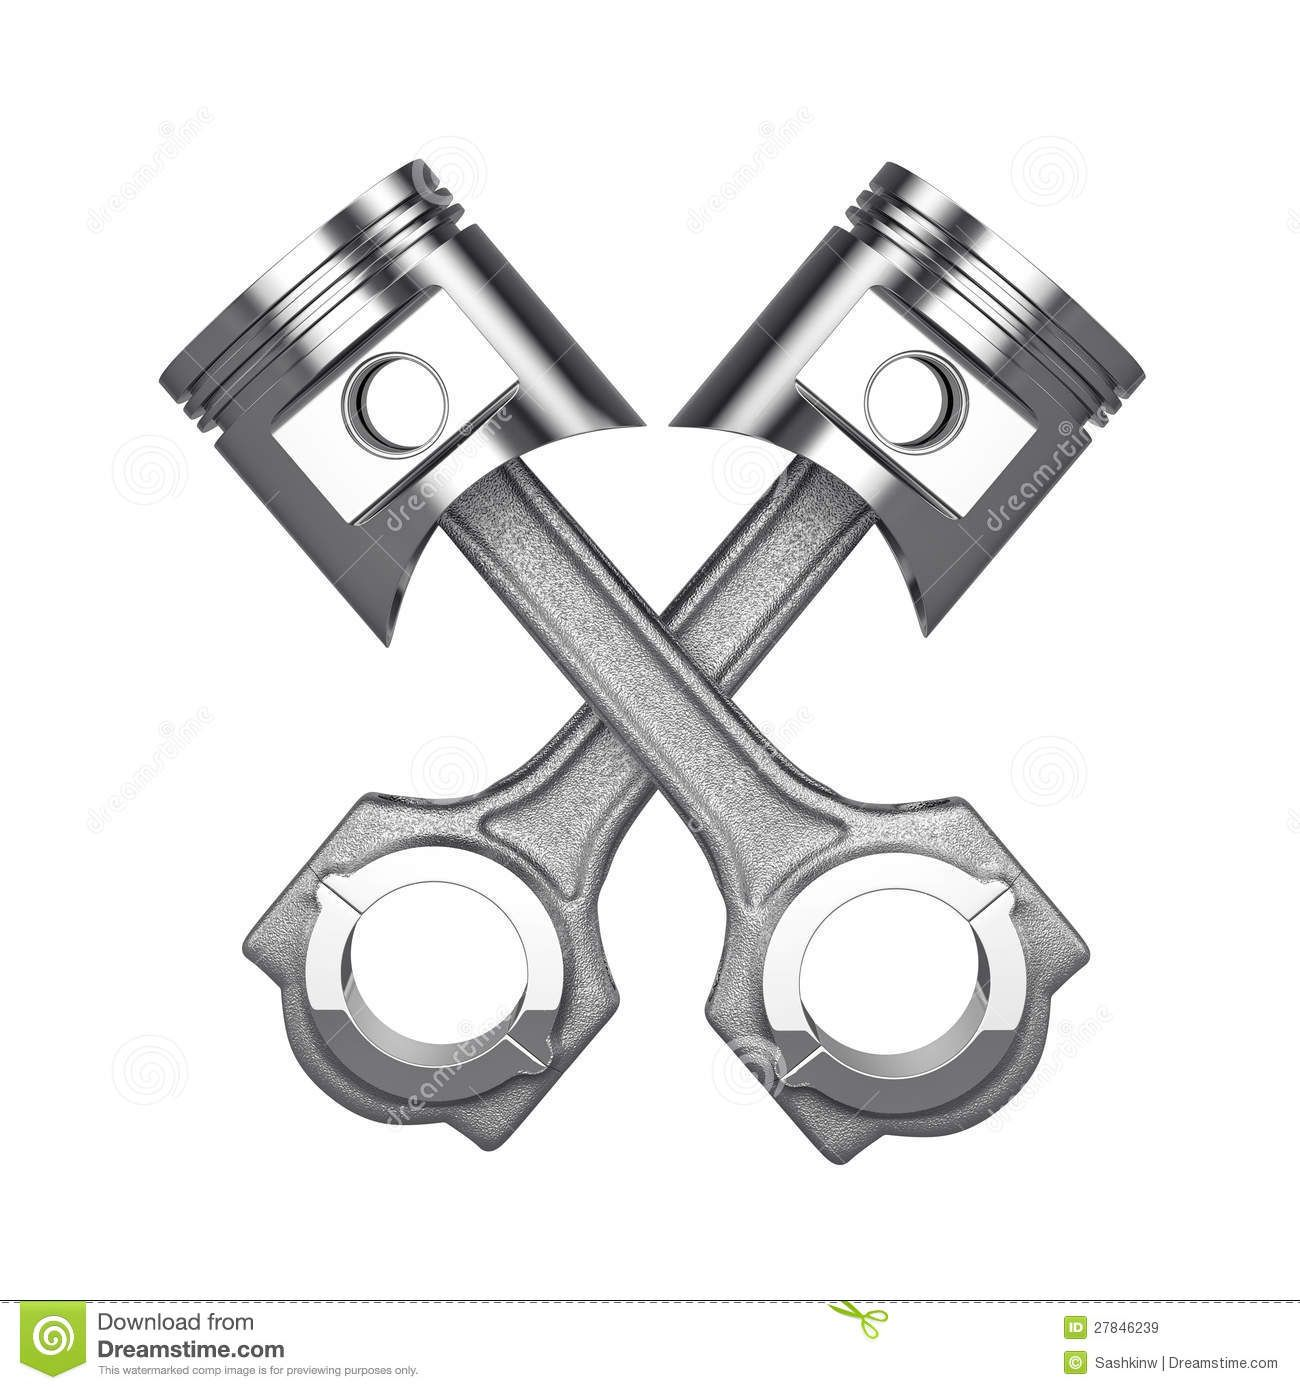 Car Piston Clip Art Engine pistons.